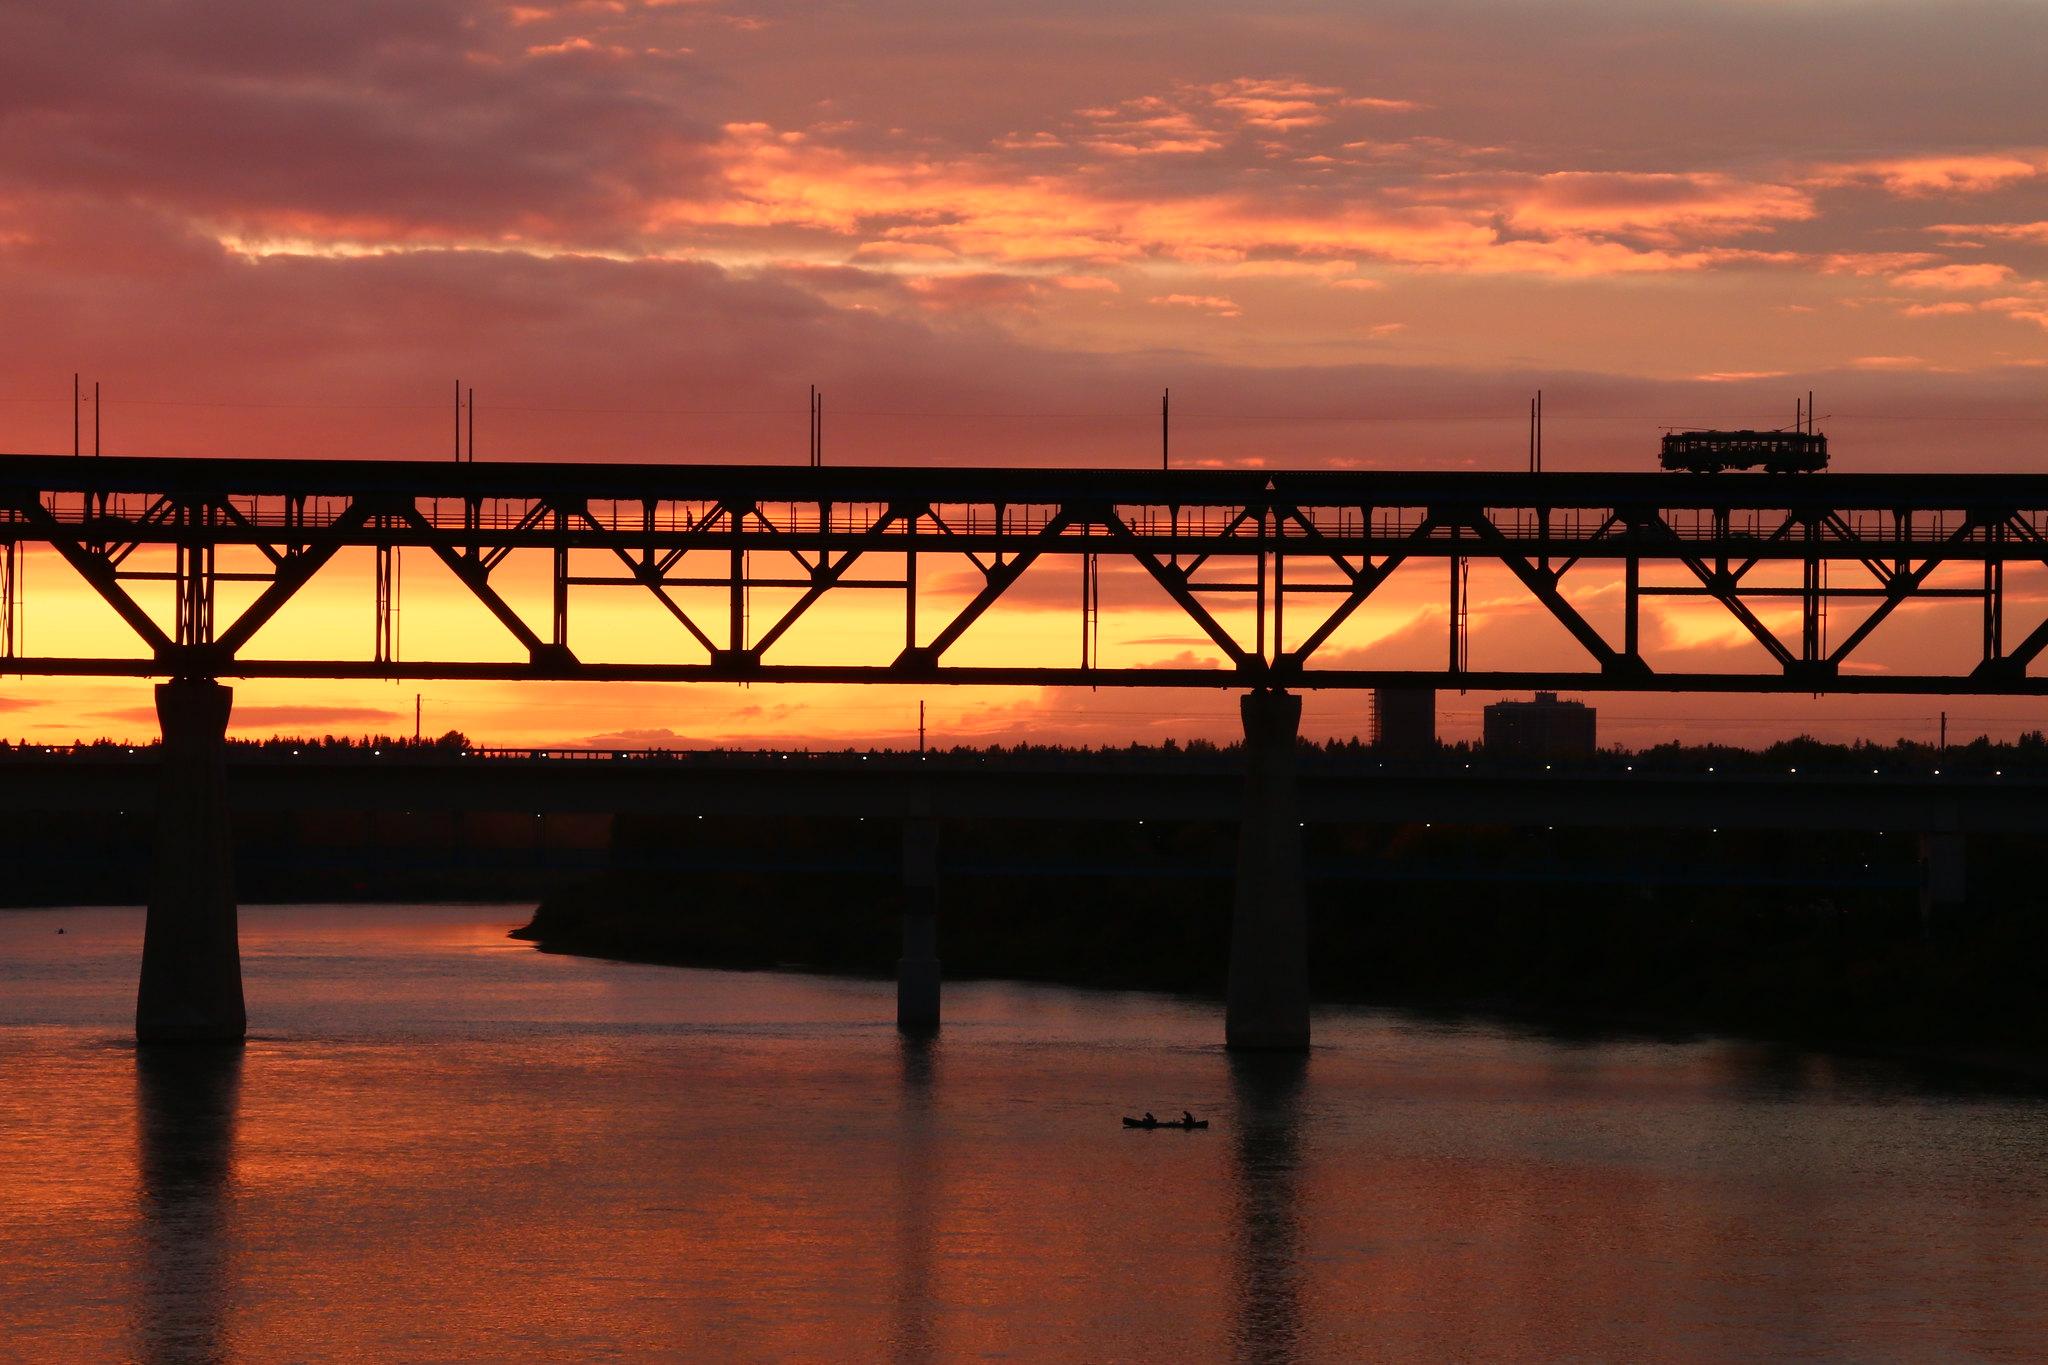 Last Summer Sunset (SOTC 343/365)